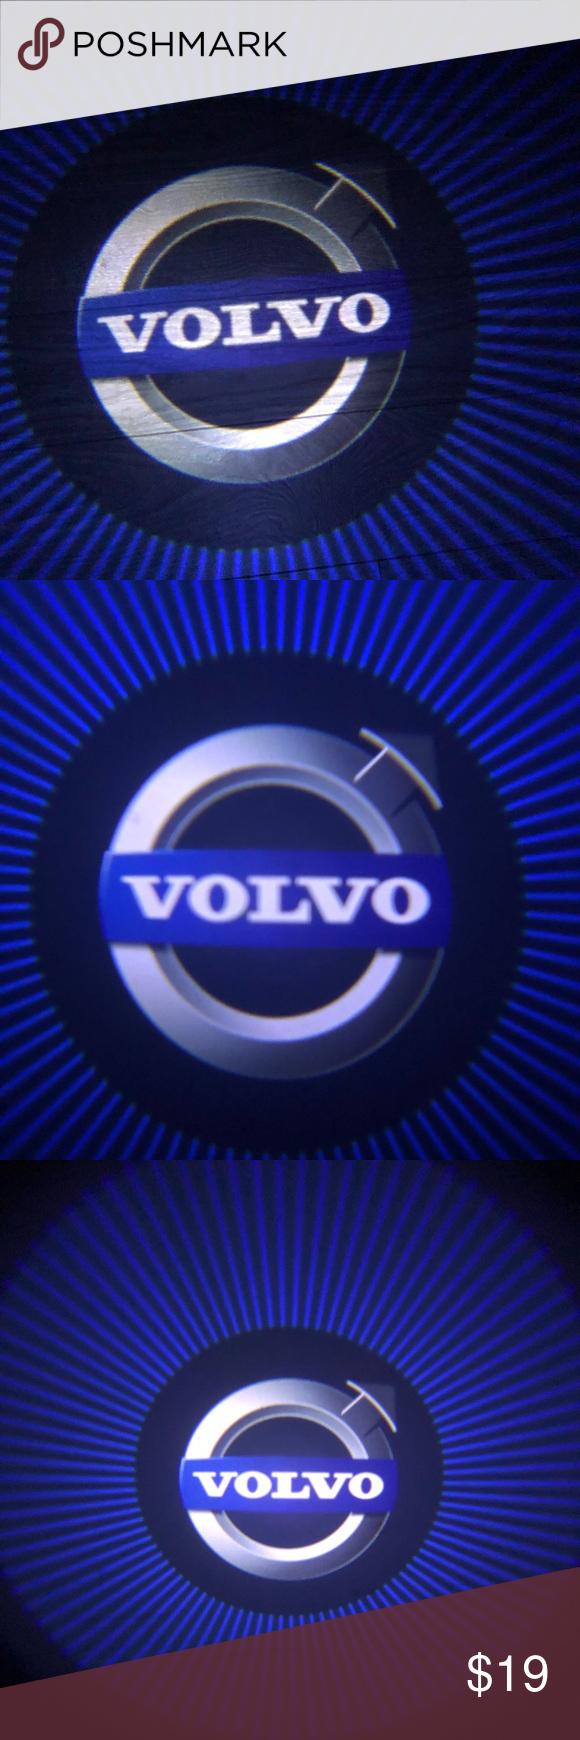 Volvo 2x cars logo wireless door lights led shadow & Volvo 2x cars logo wireless door lights led shadow NWT | Car logos ...